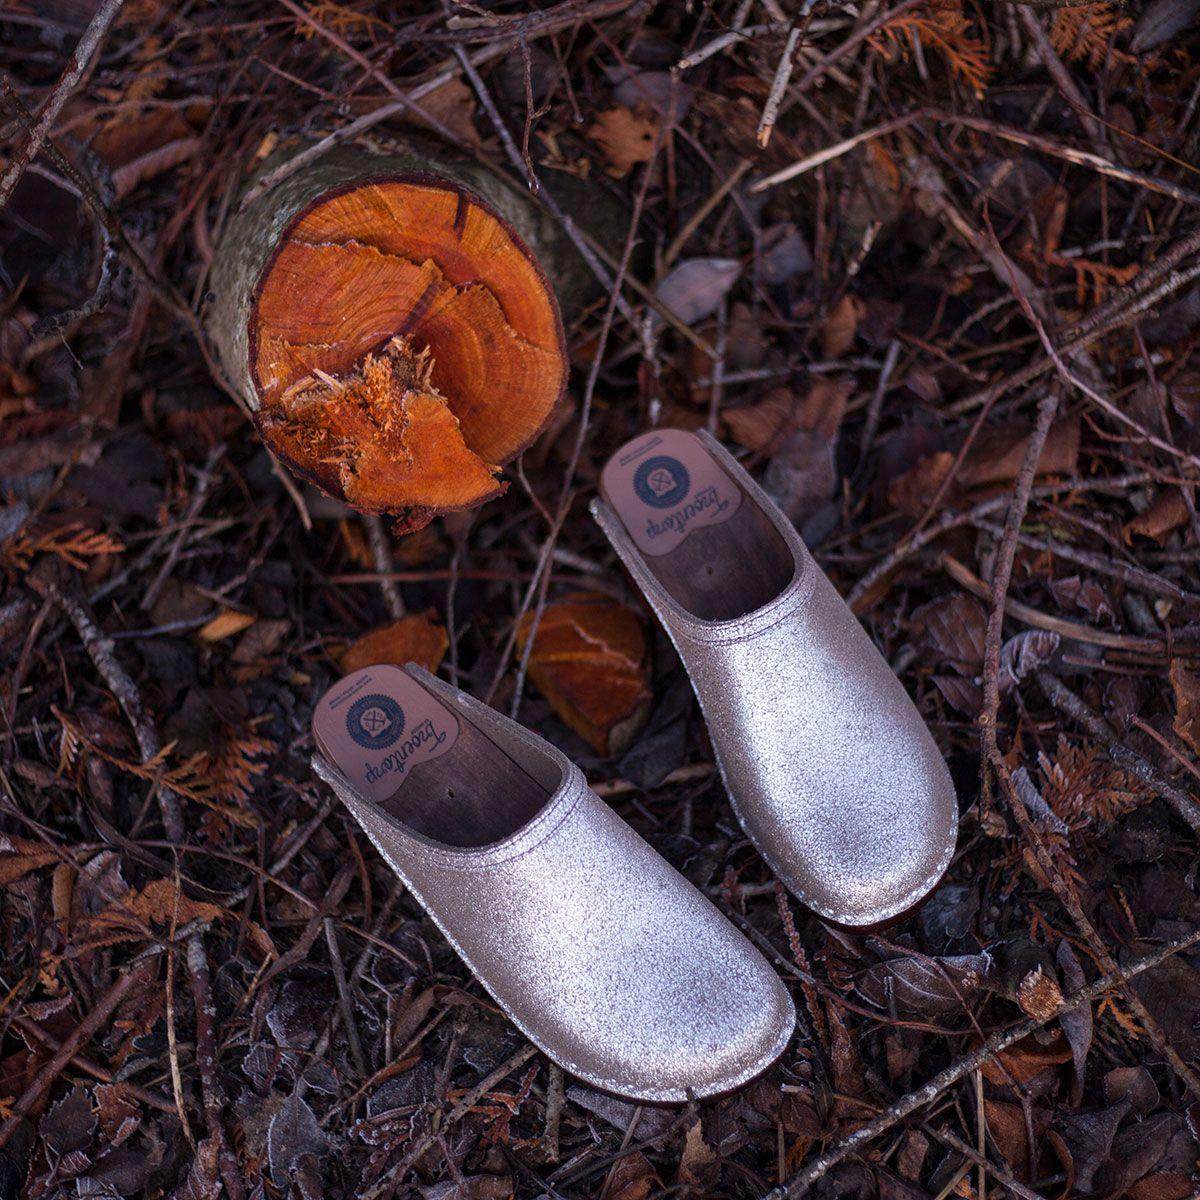 b7ada43cfc1e5 Wooden clogs in silver stardust leather - Troentorp Clogs, Bastad ...